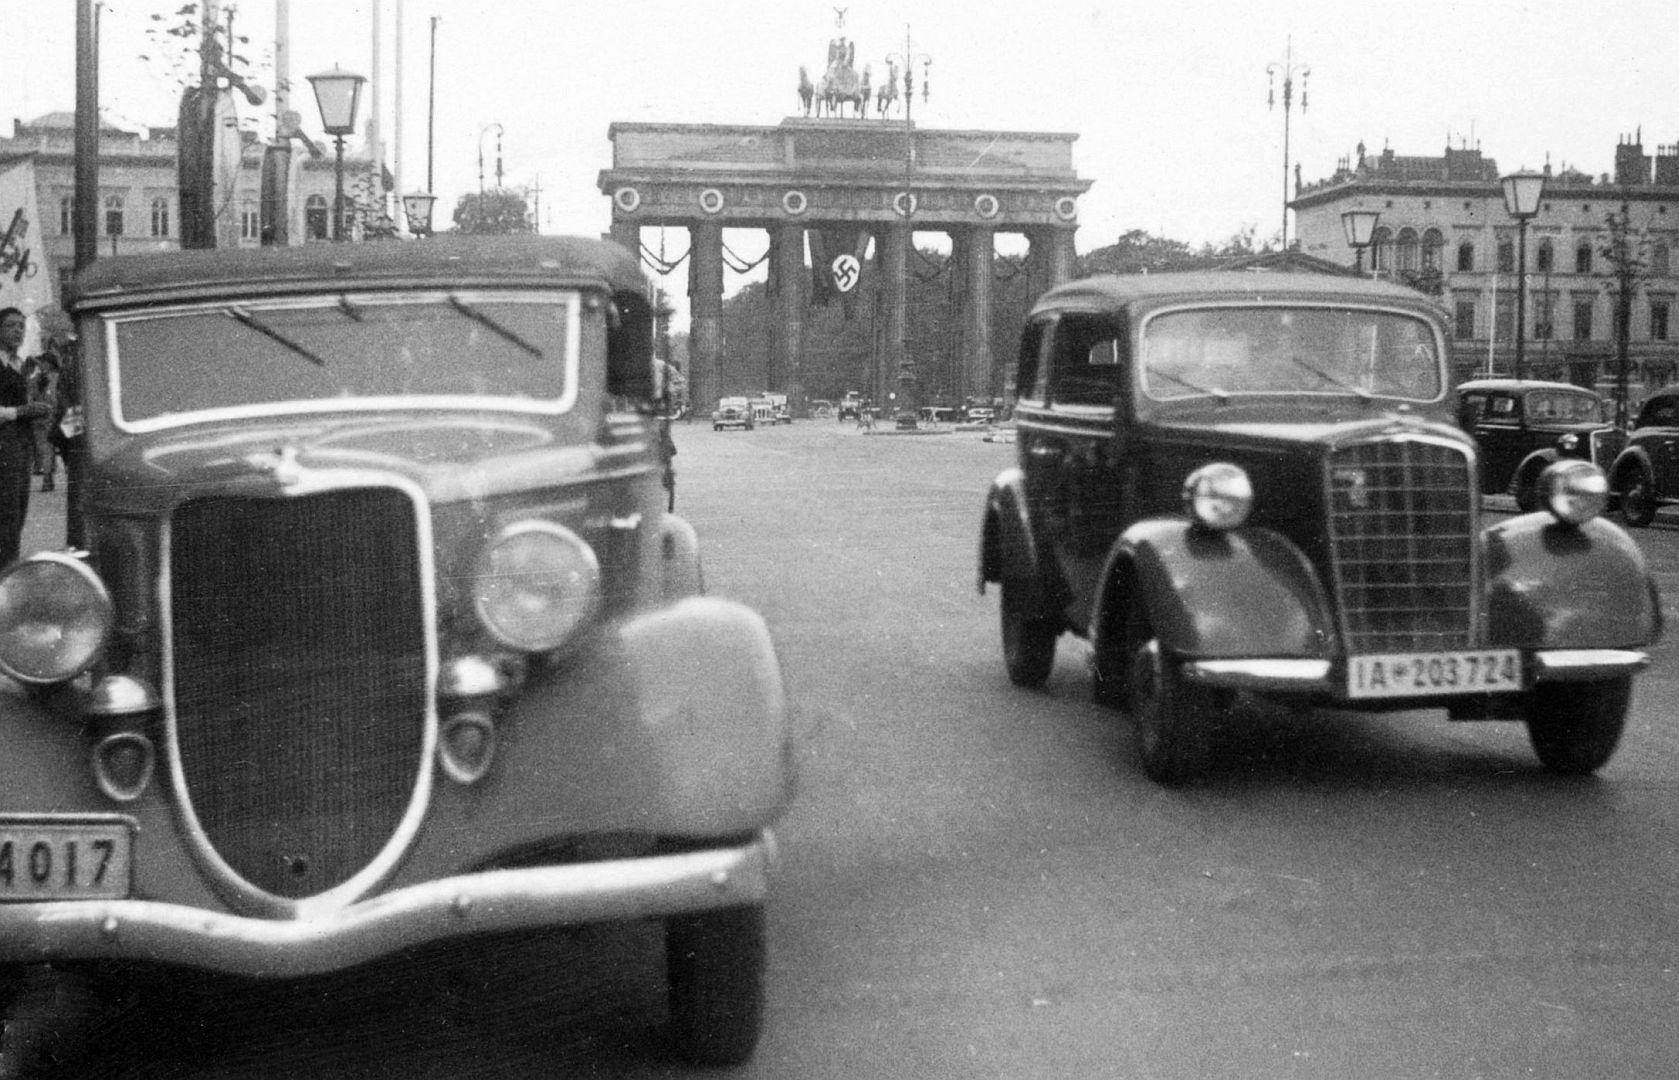 Ford_Rheinland_Opel_2_liter_Berlin_Galerie